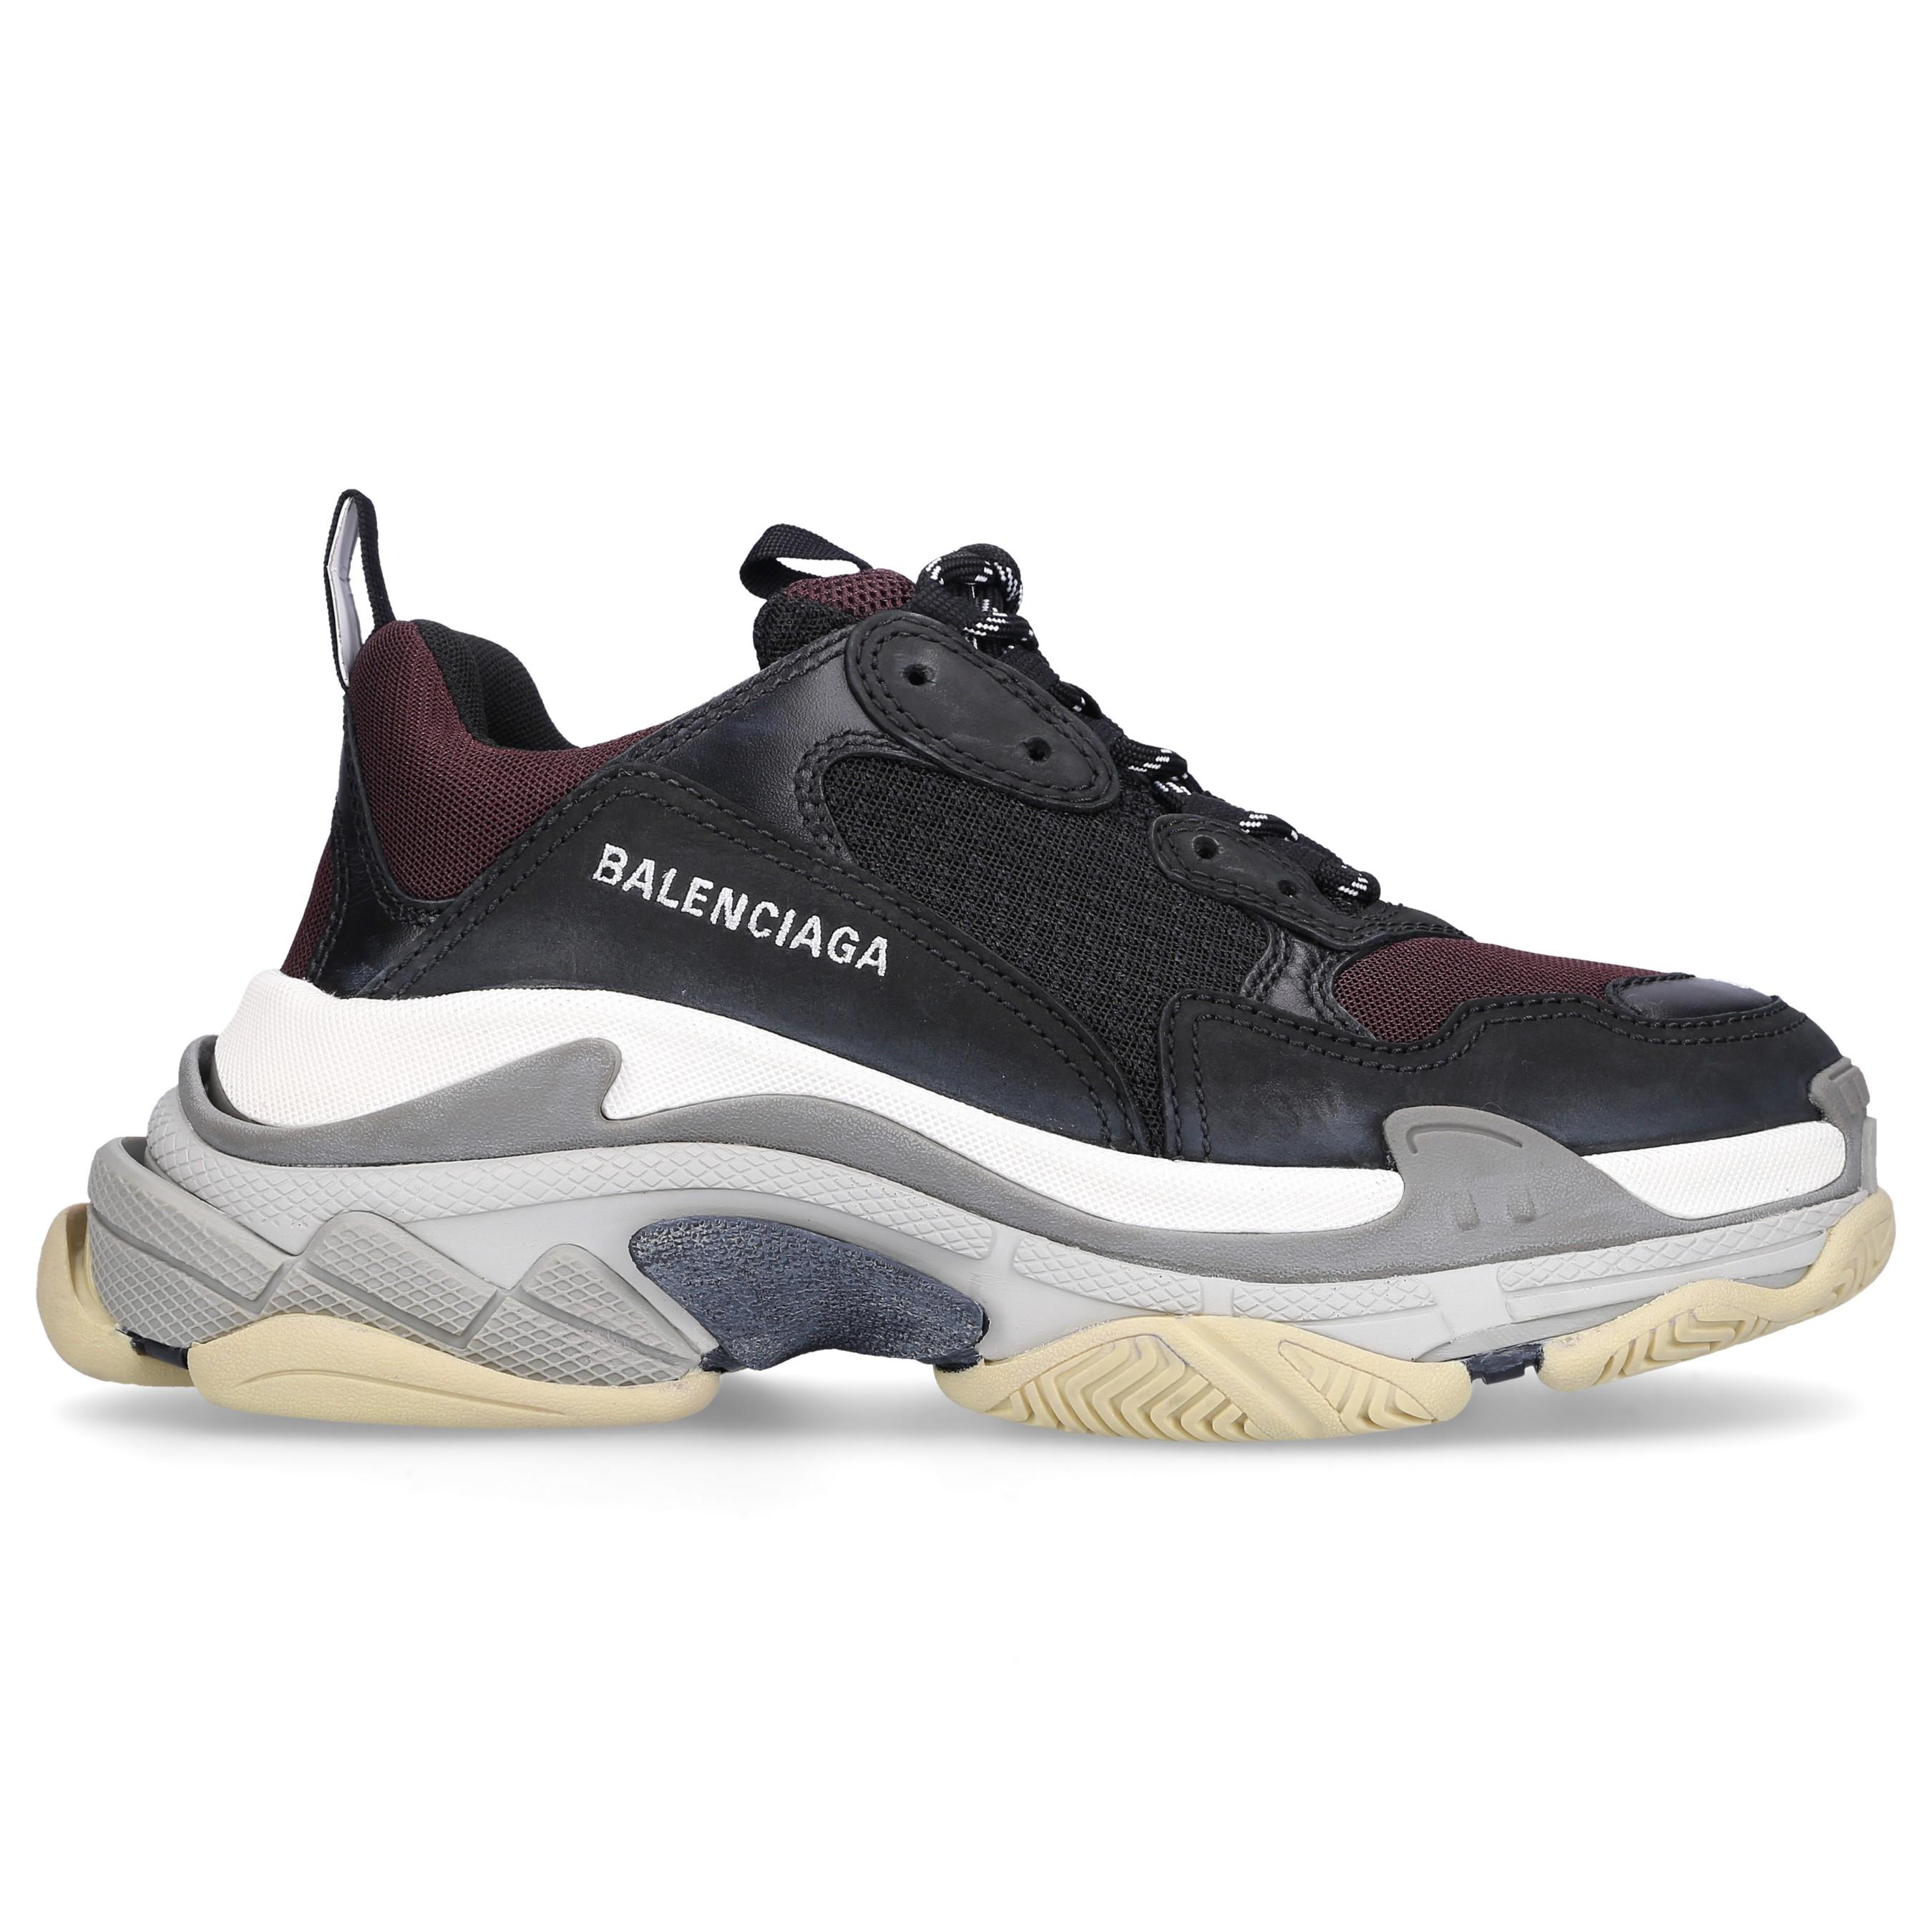 Balenciaga Sneaker Sneaker low TRIPLE S Kalbsleder Lammleder Polyester Logo bordeaux schwarz